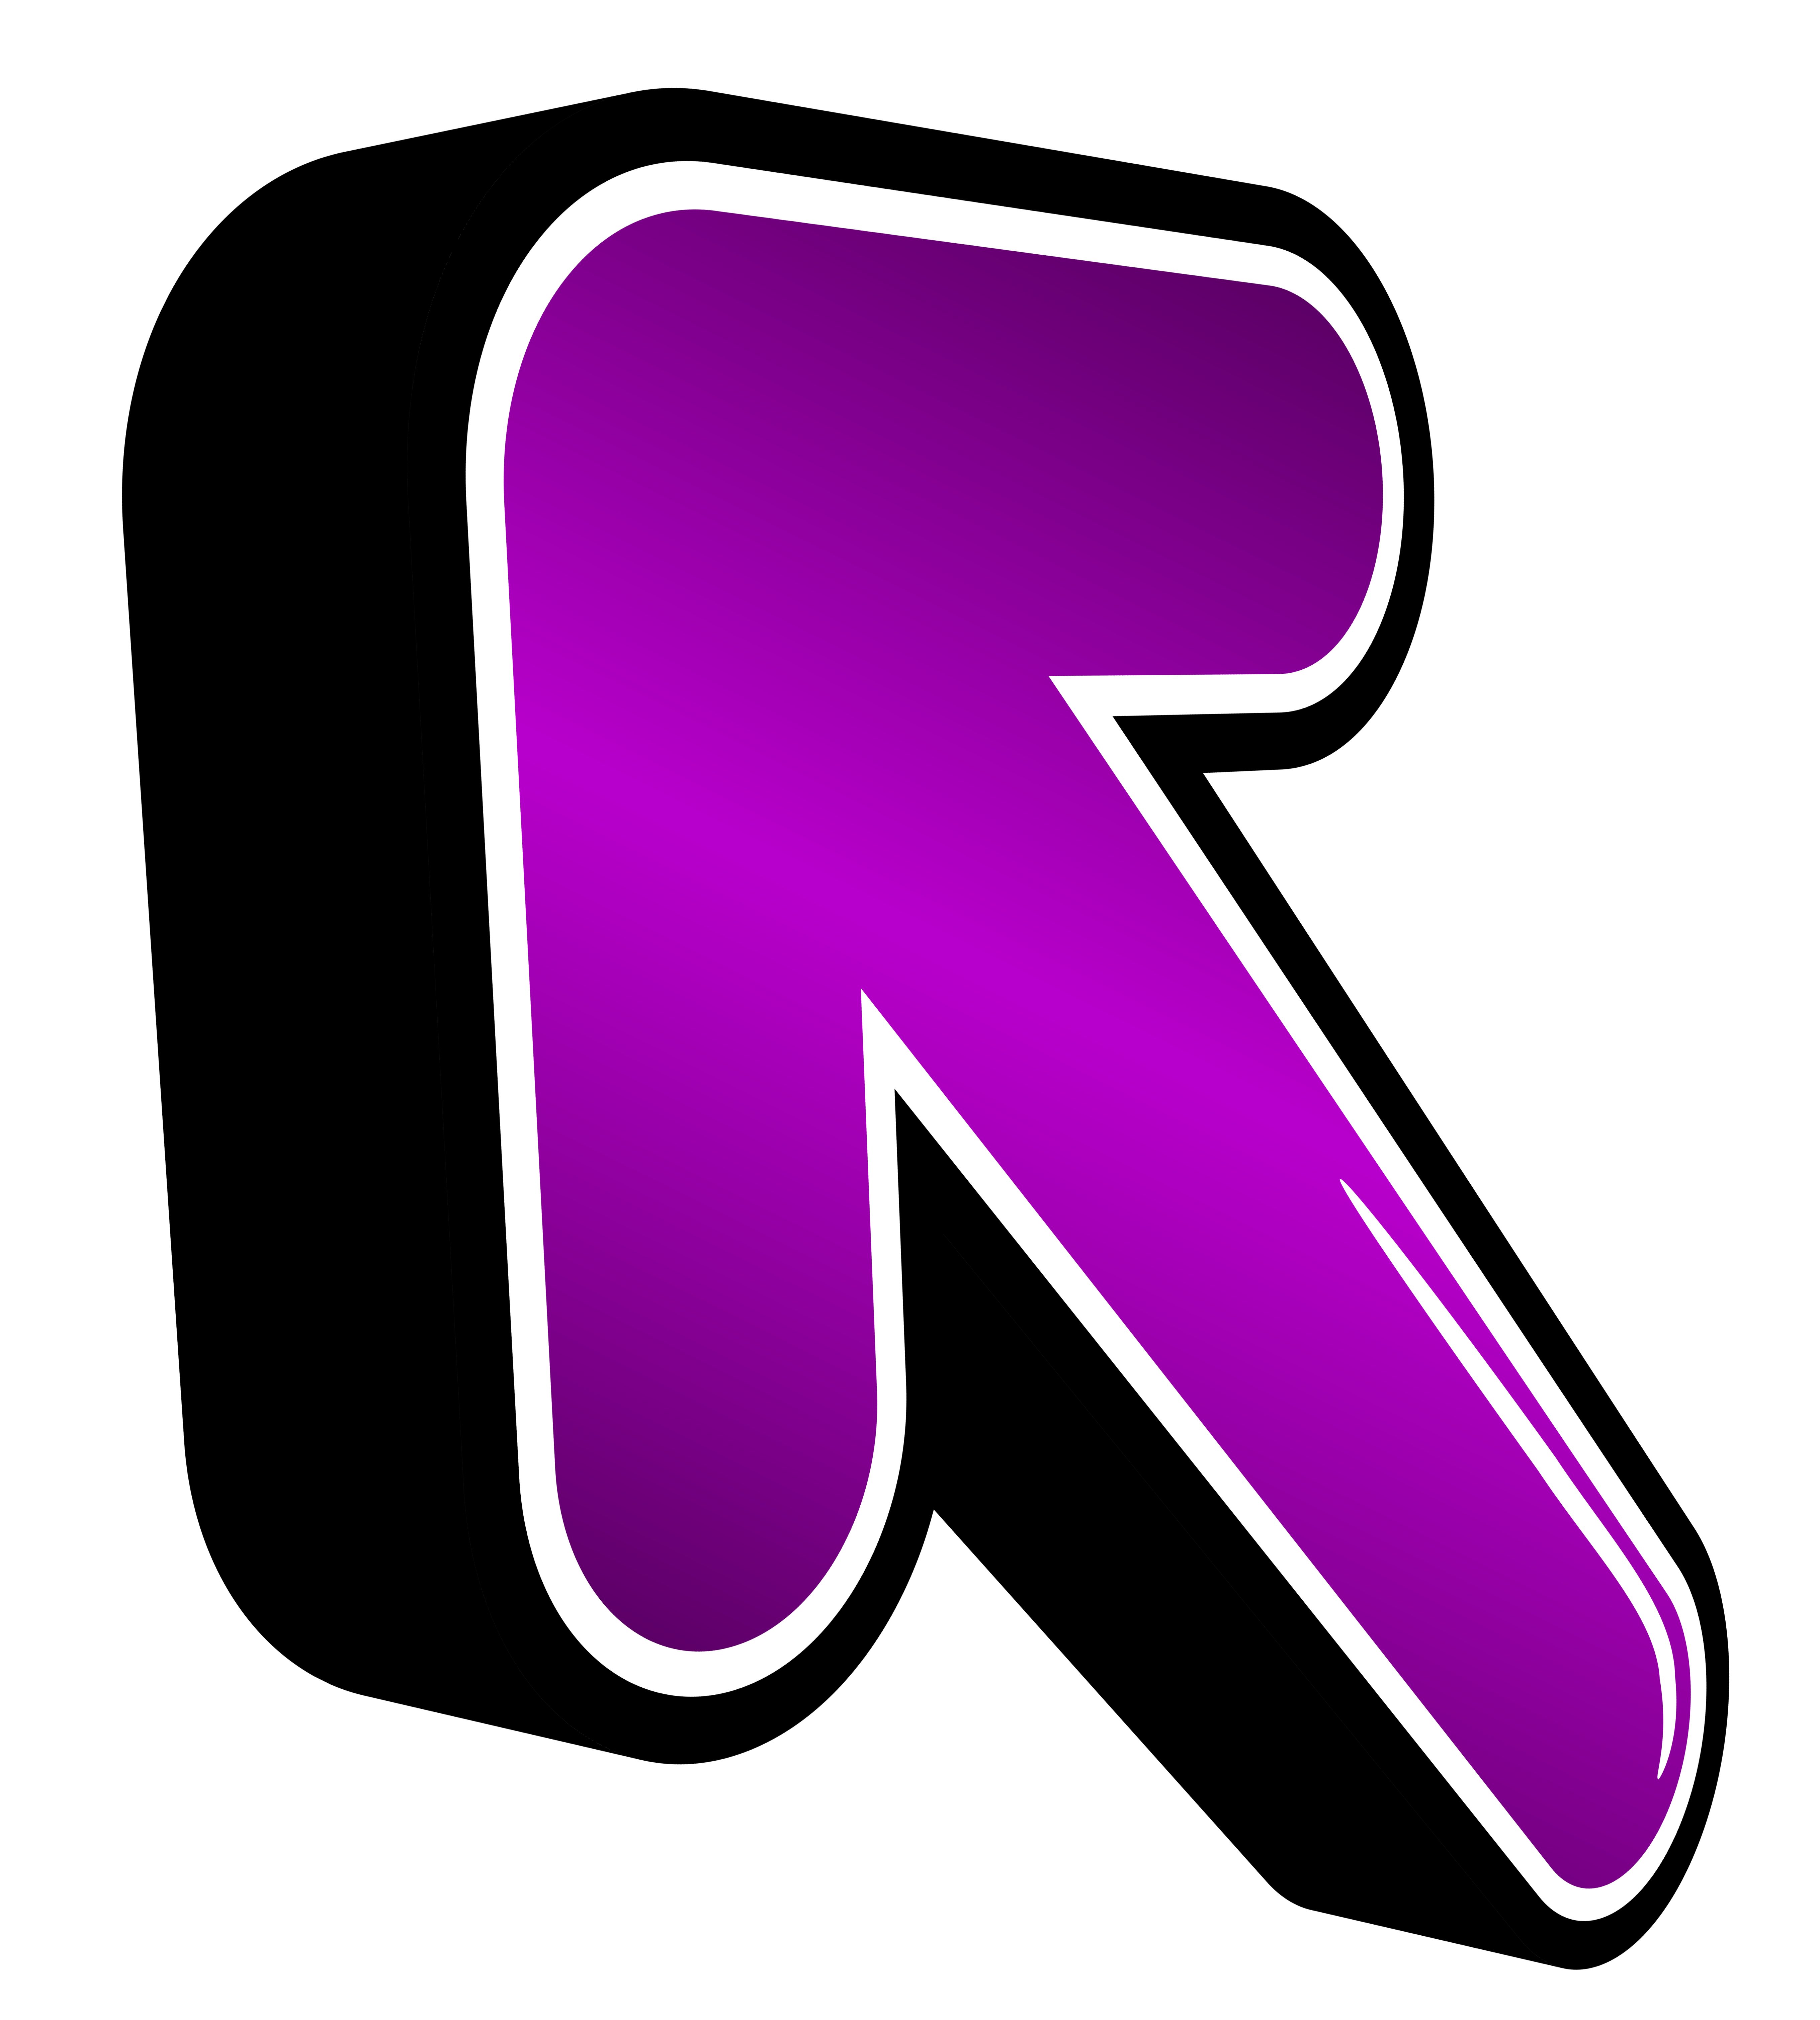 picture royalty free stock Purple arrow clipart.  d transparent png.